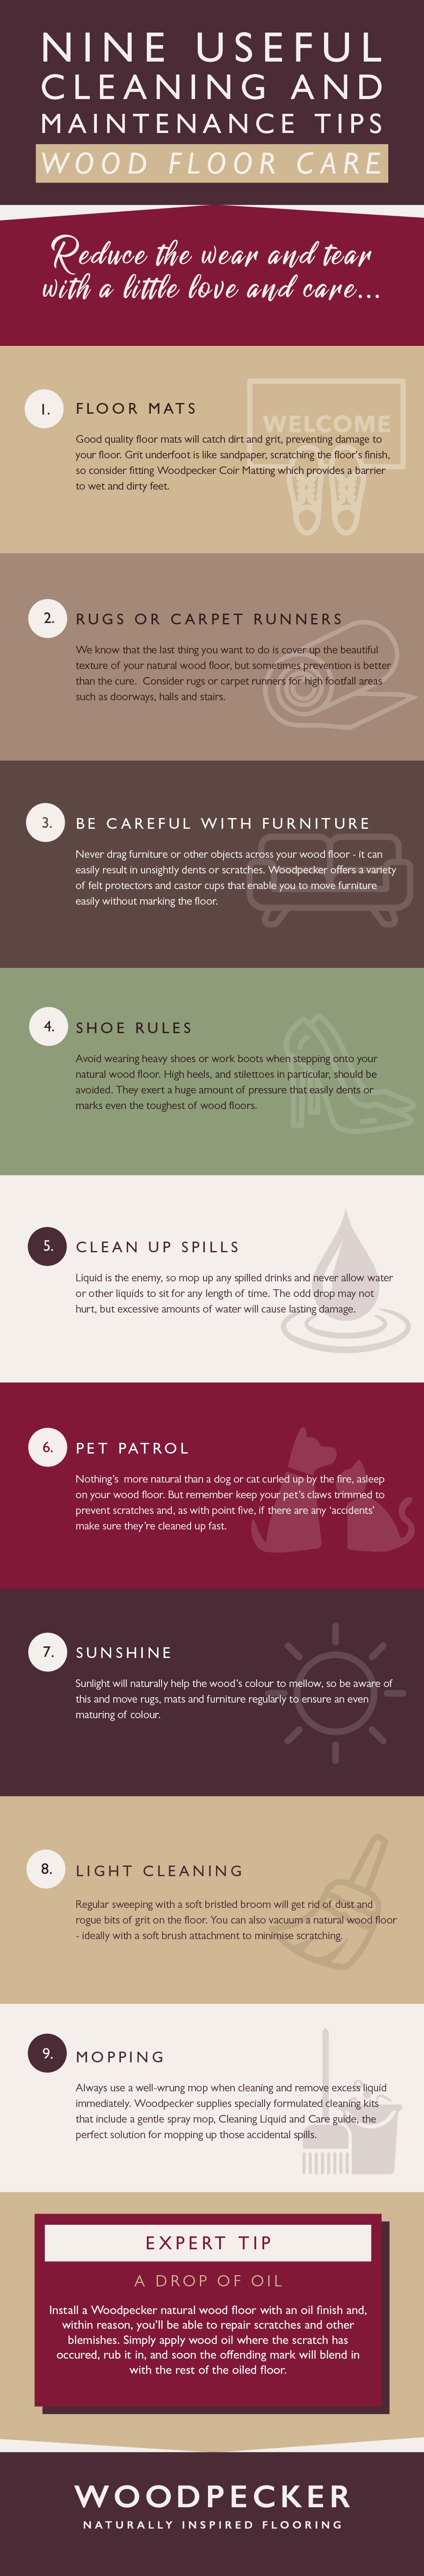 Wood flooring care